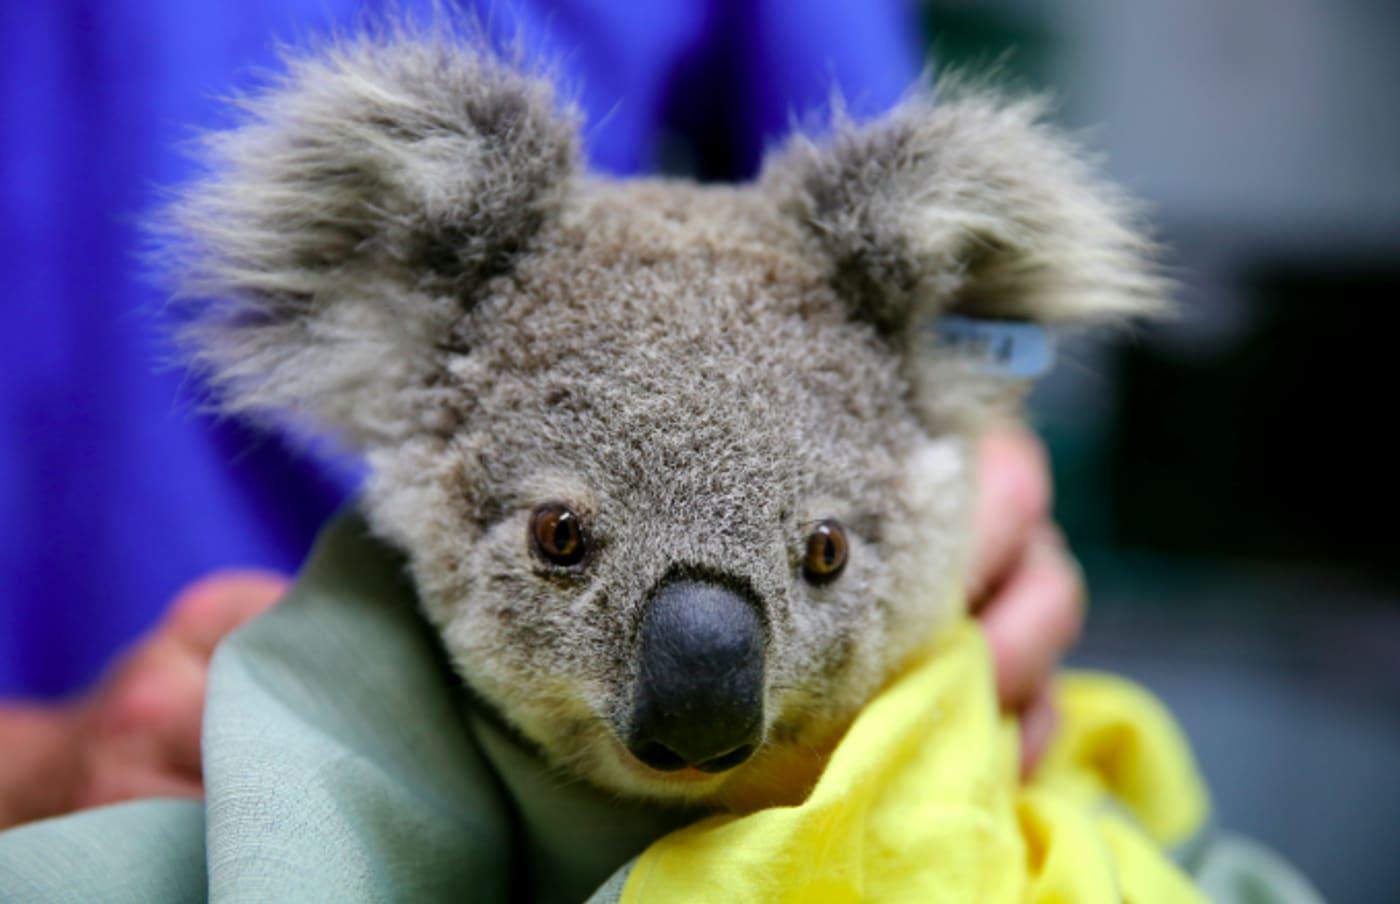 A koala named Pete from Pappinbarra at The Port Macquarie Koala Hospital